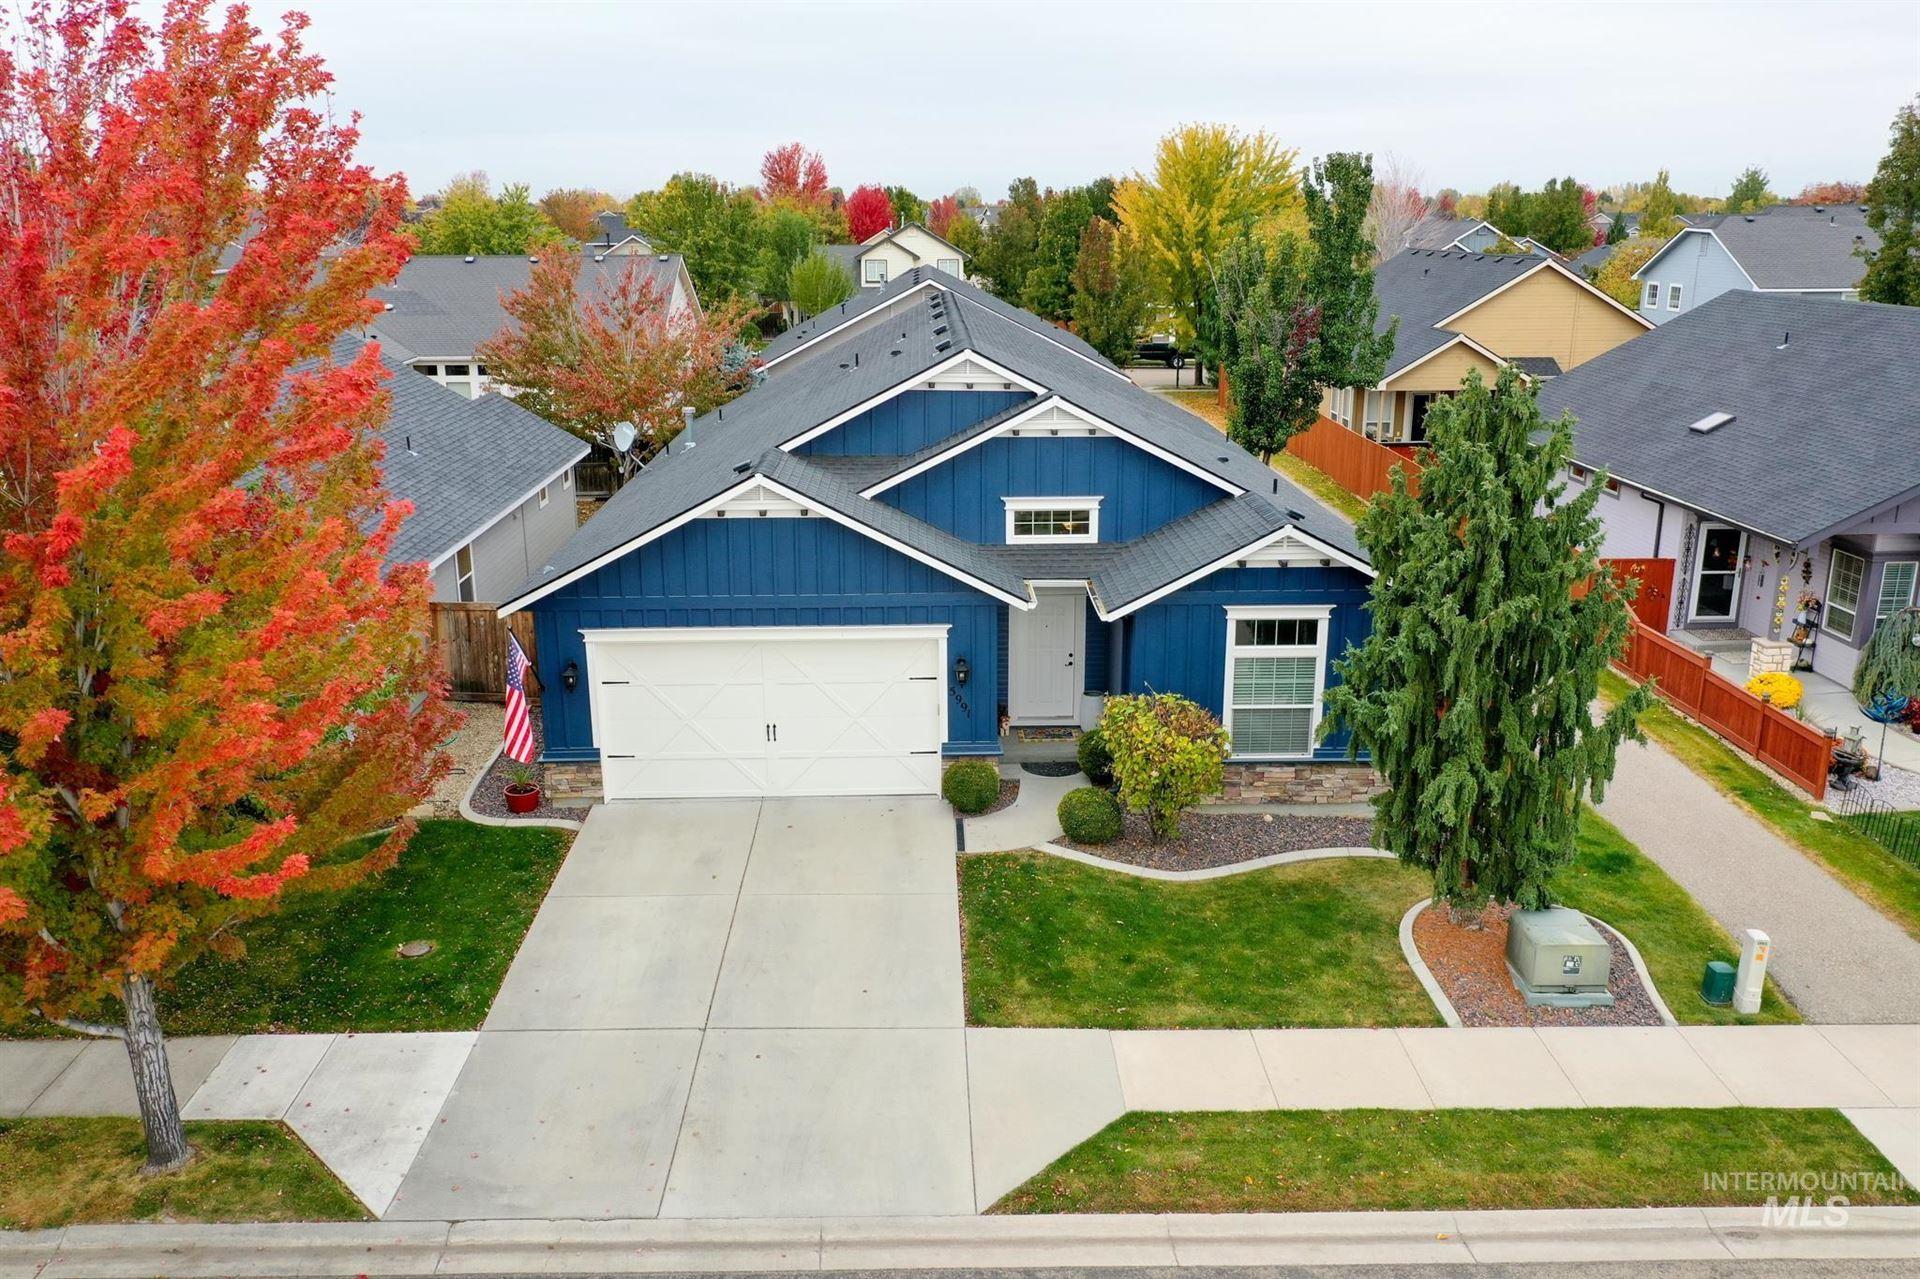 5991 S Rising Sun Way, Boise, ID 83709 - MLS#: 98822314